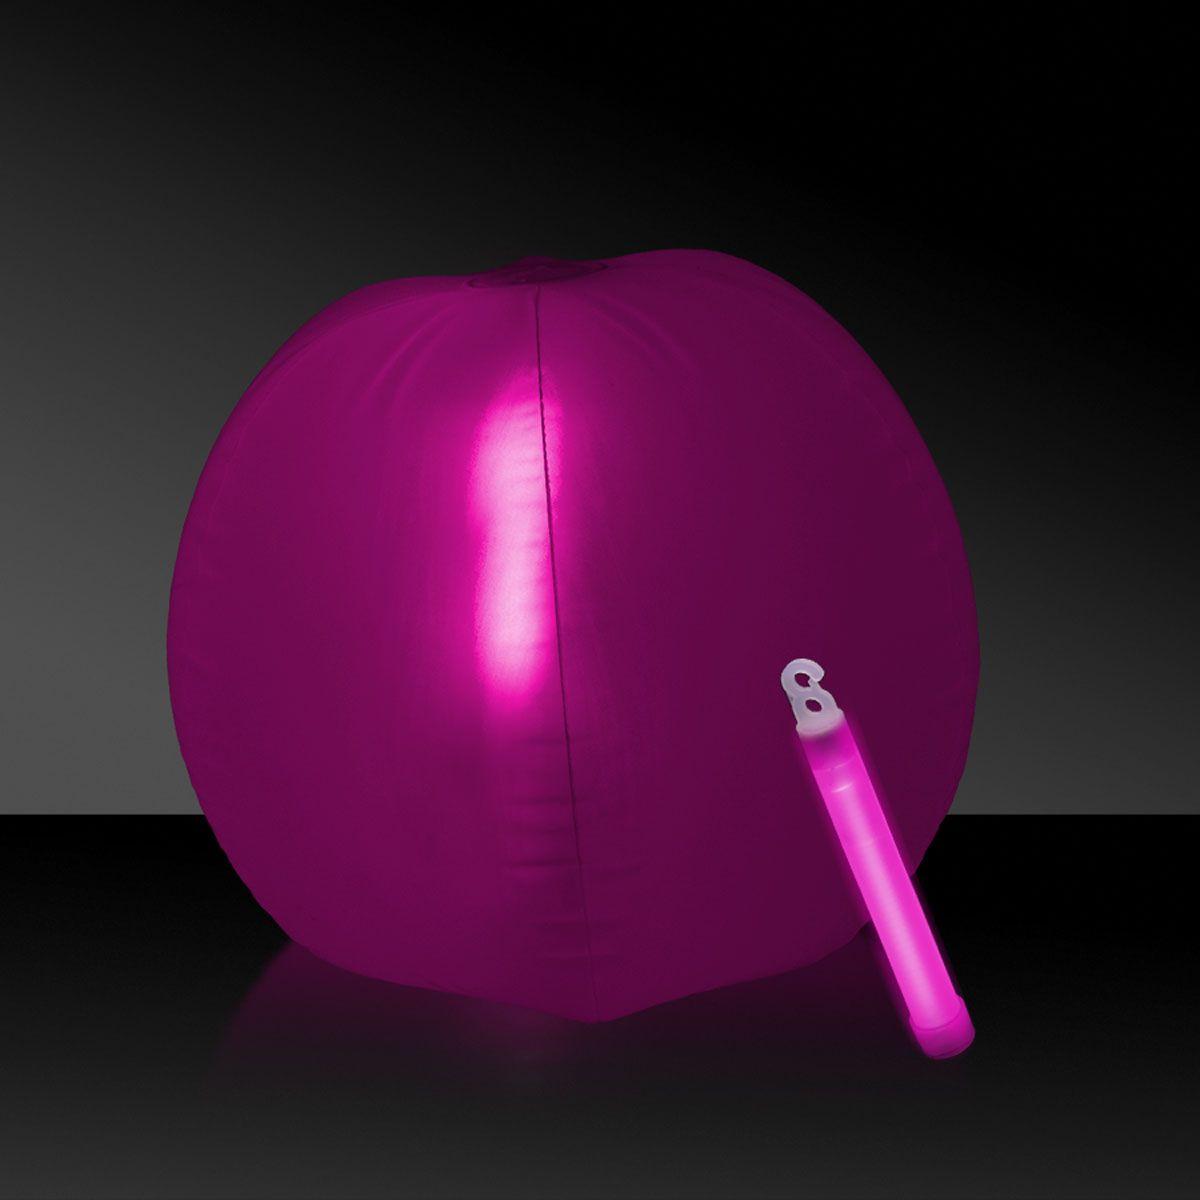 "Glow in the Dark Beach Ball - 12"""" Pink, 1 Each"" GNO105EA"